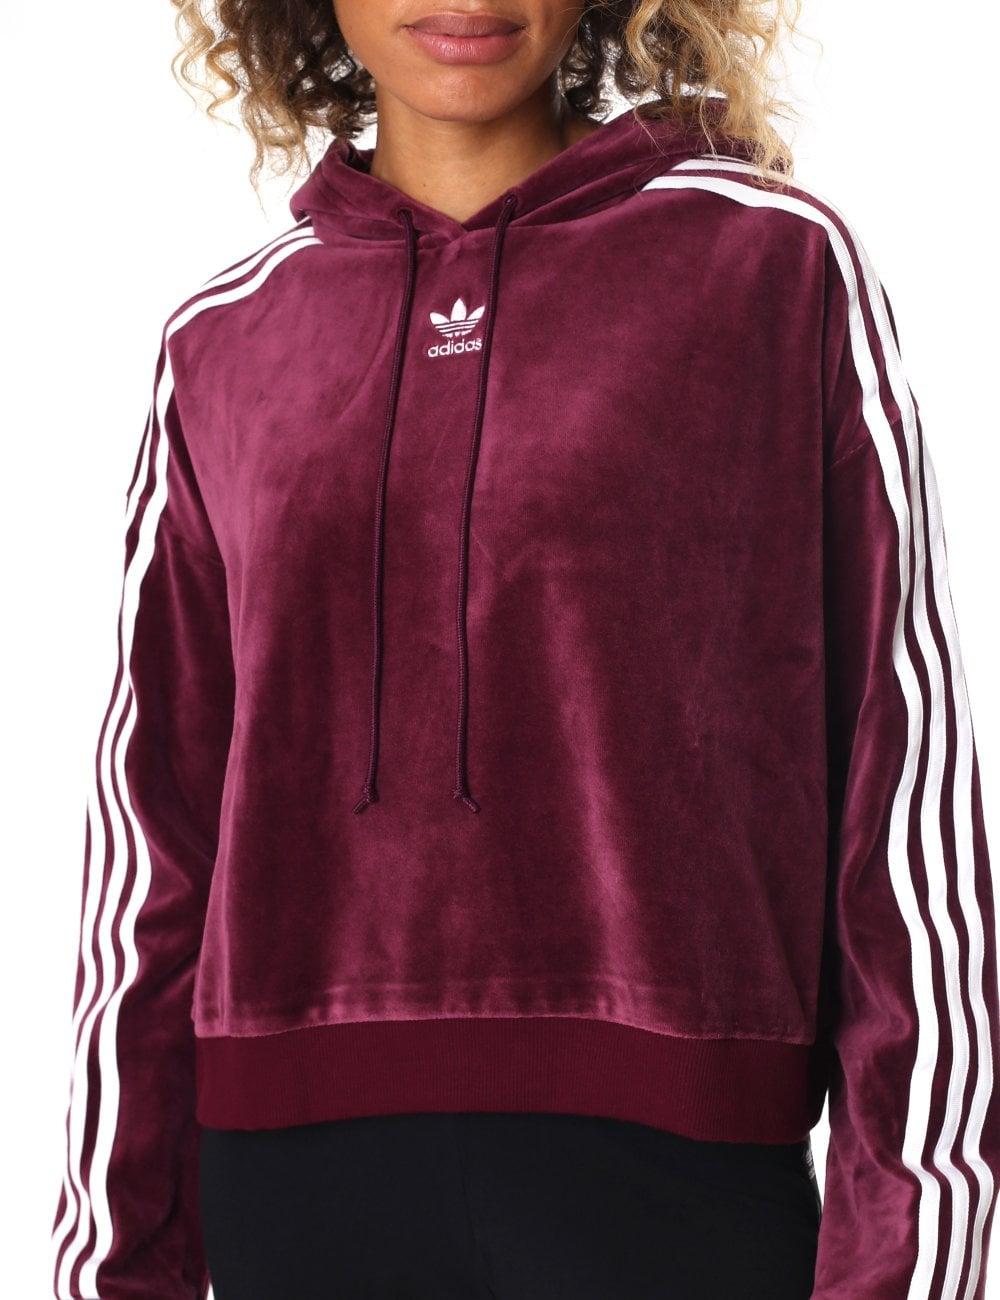 Adidas Women's Cropped Hoodie Black